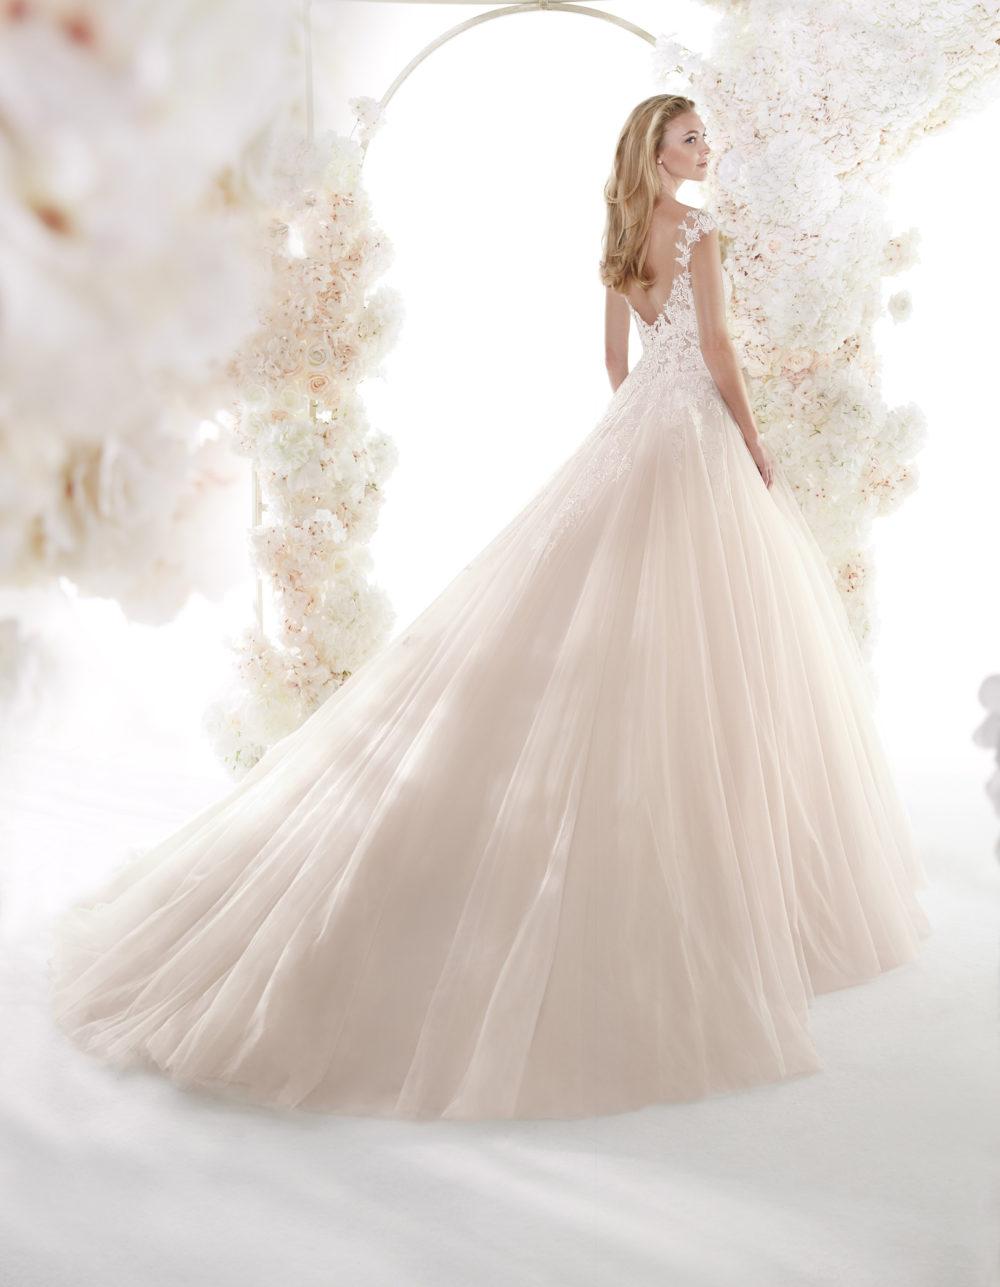 Mariages: abito da sposa Colet 2020 a Vicenza, Verona, Padova, Veneto COA20891